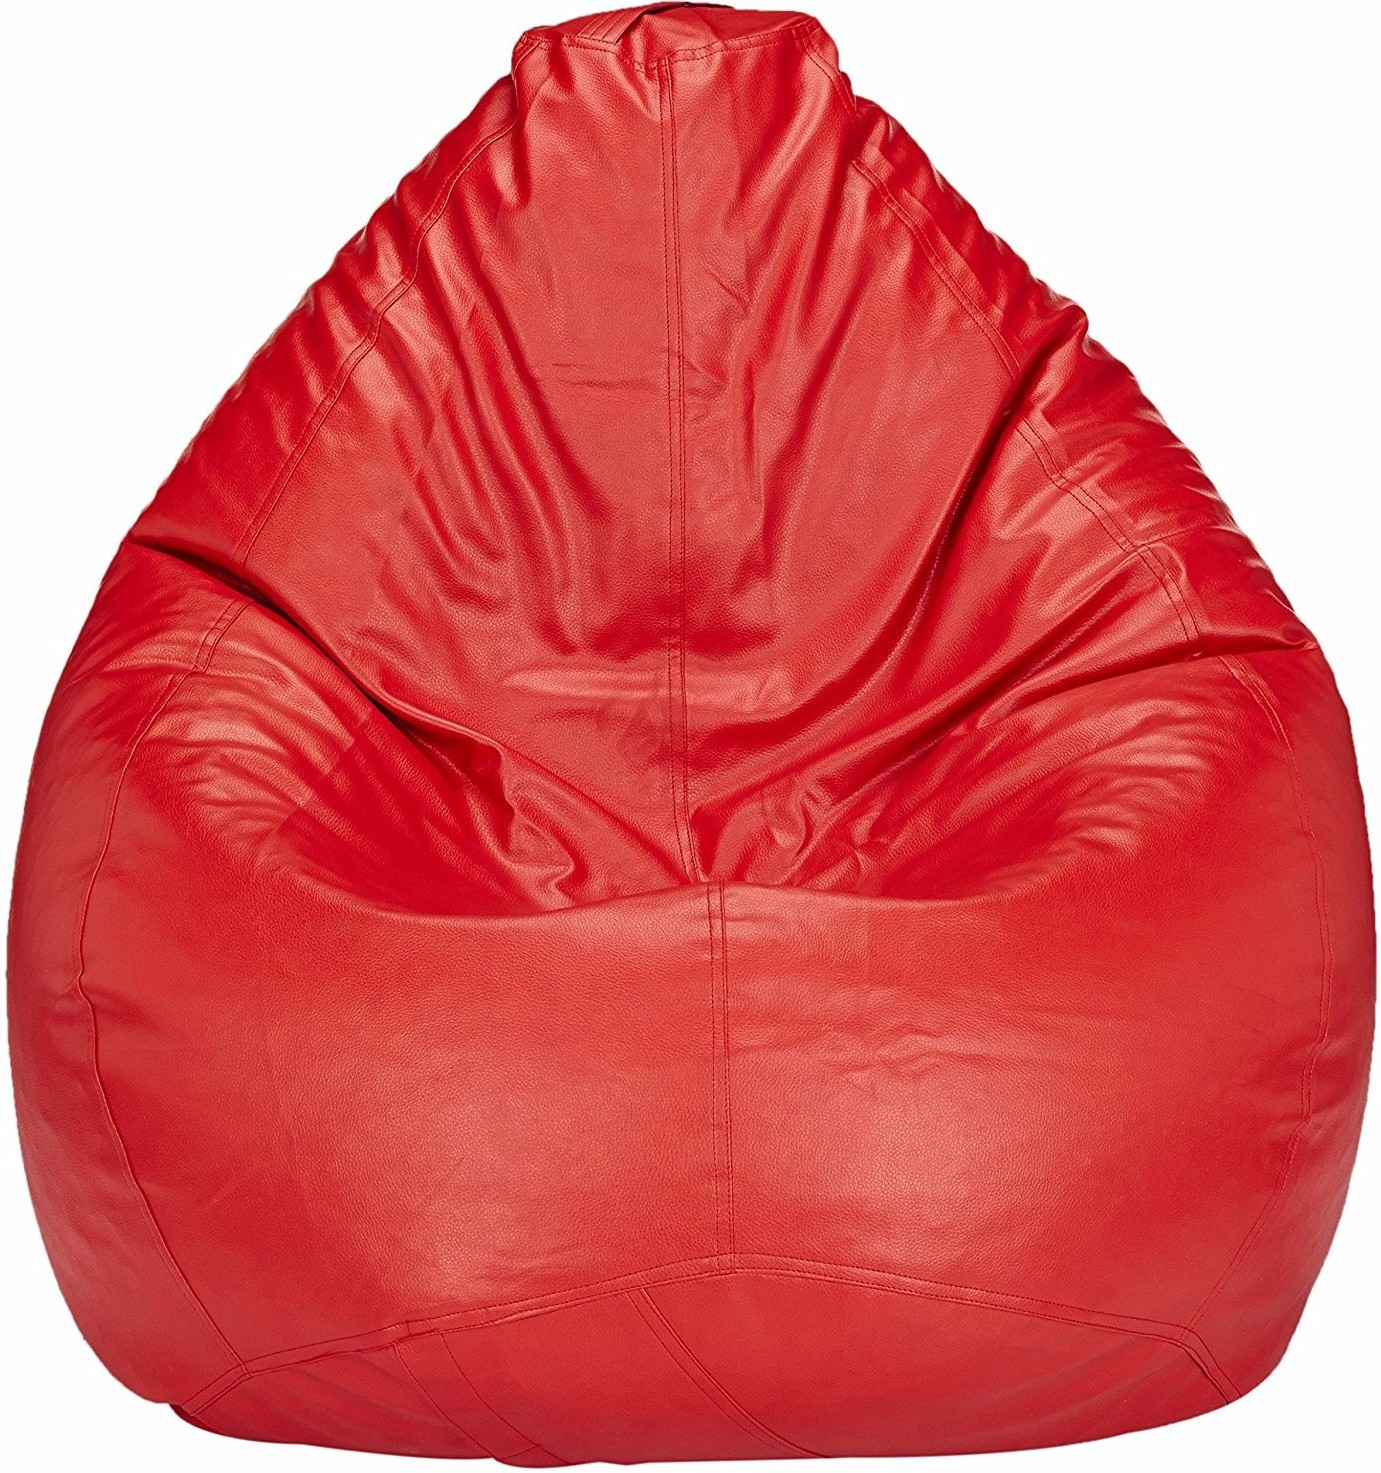 View VSK XXXL Bean Bag Cover(Red) Furniture (VSK)